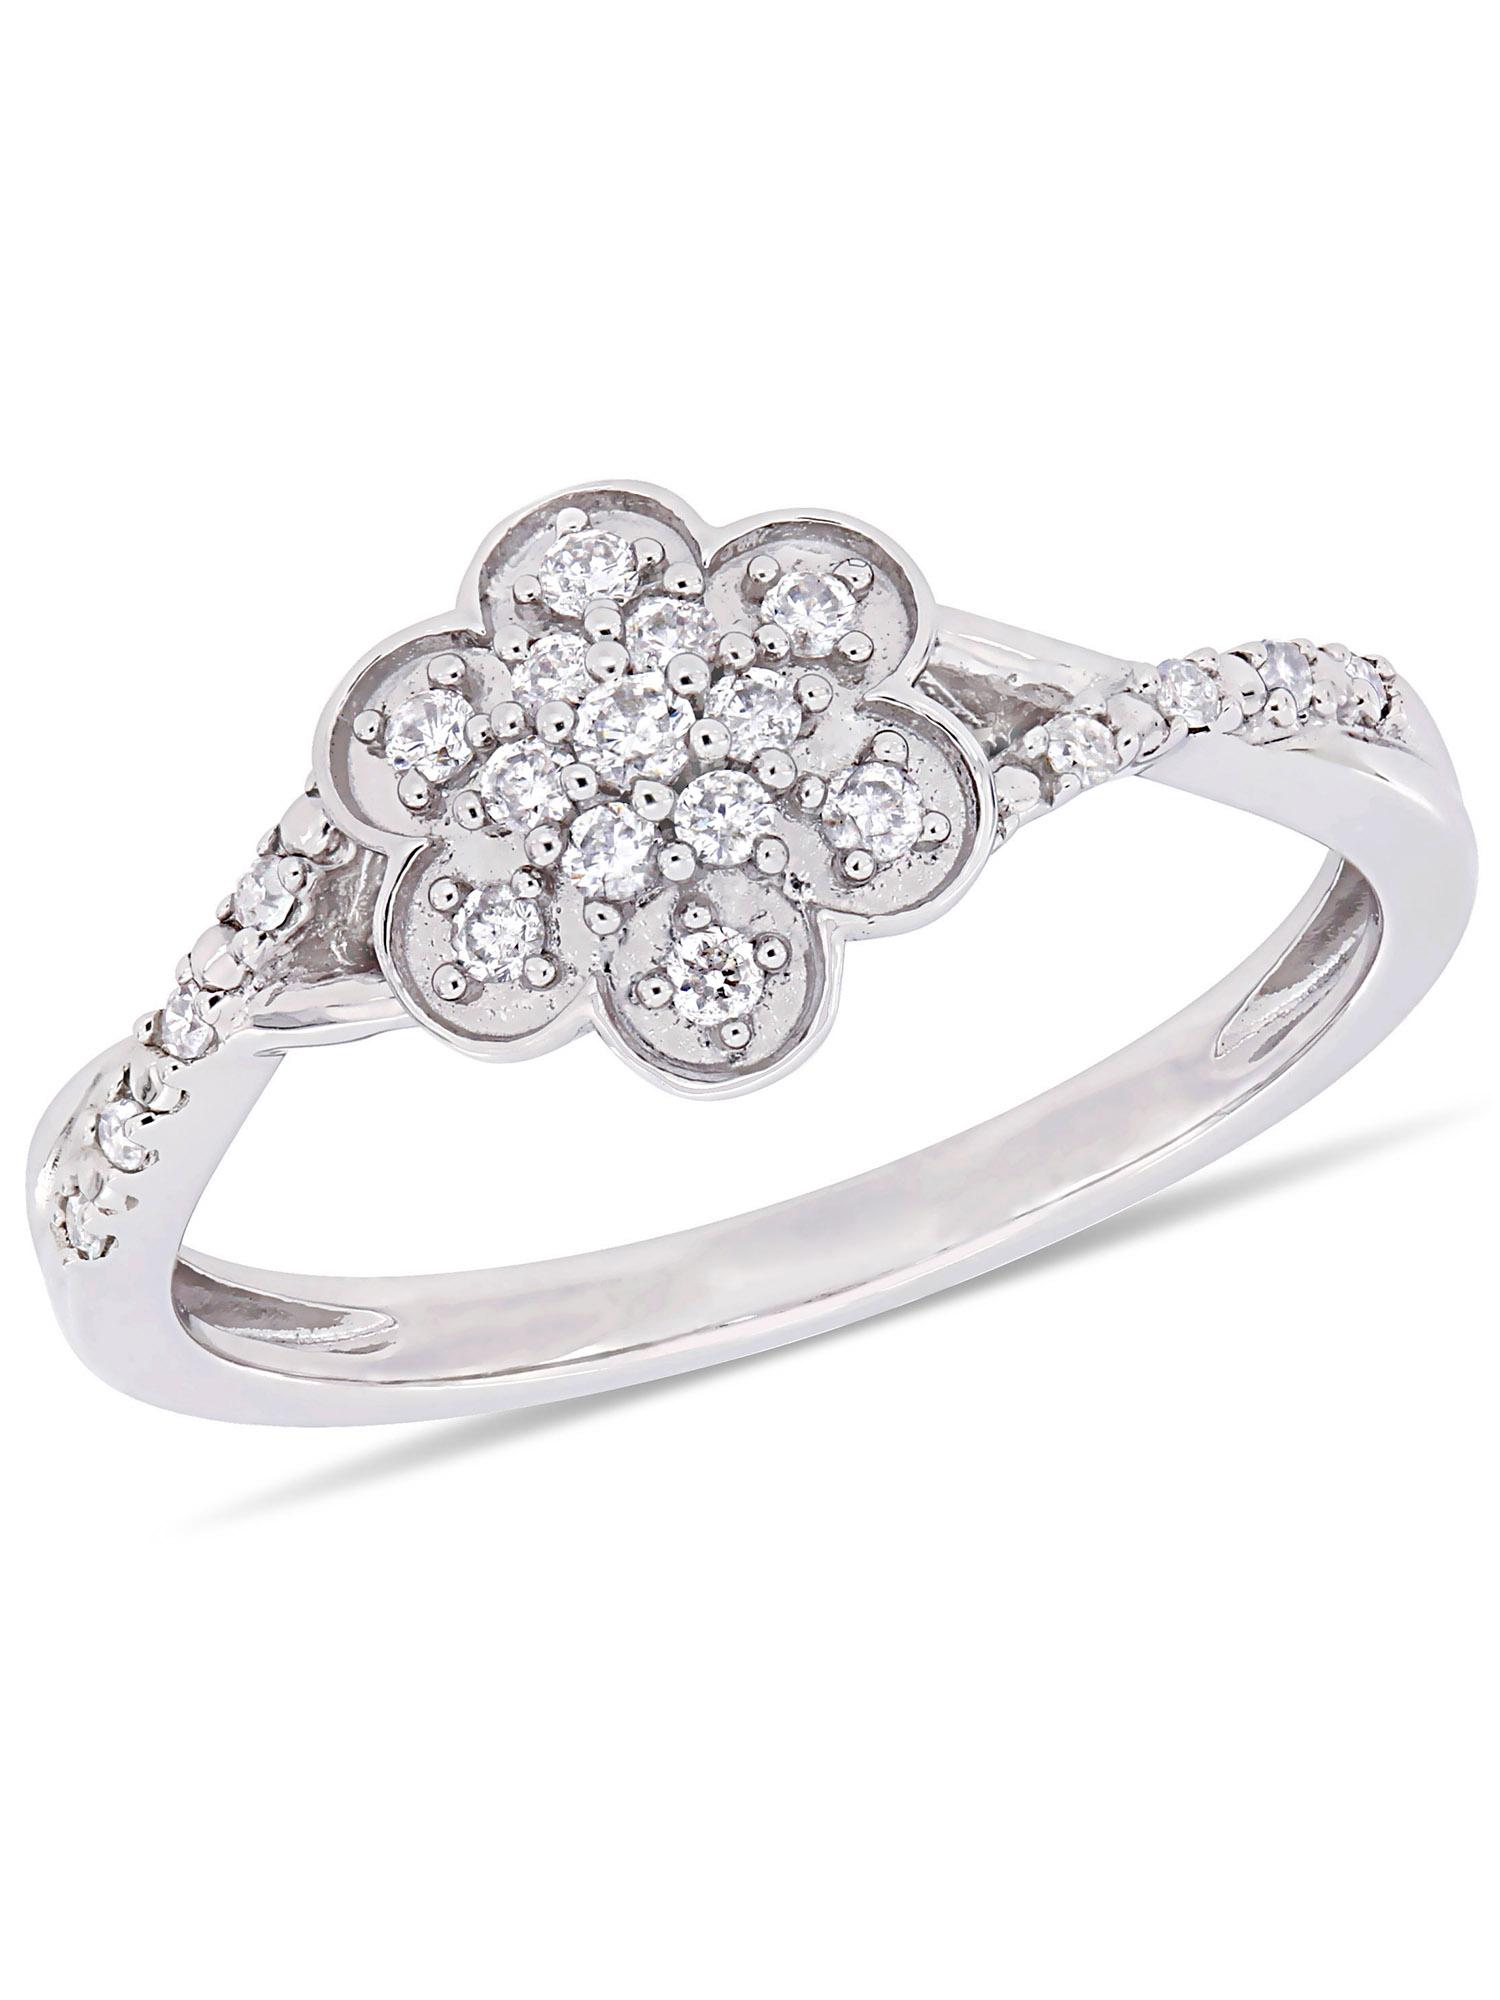 Miabella 1/5 Carat T.W. Diamond 10k White Gold Floral Promise Ring